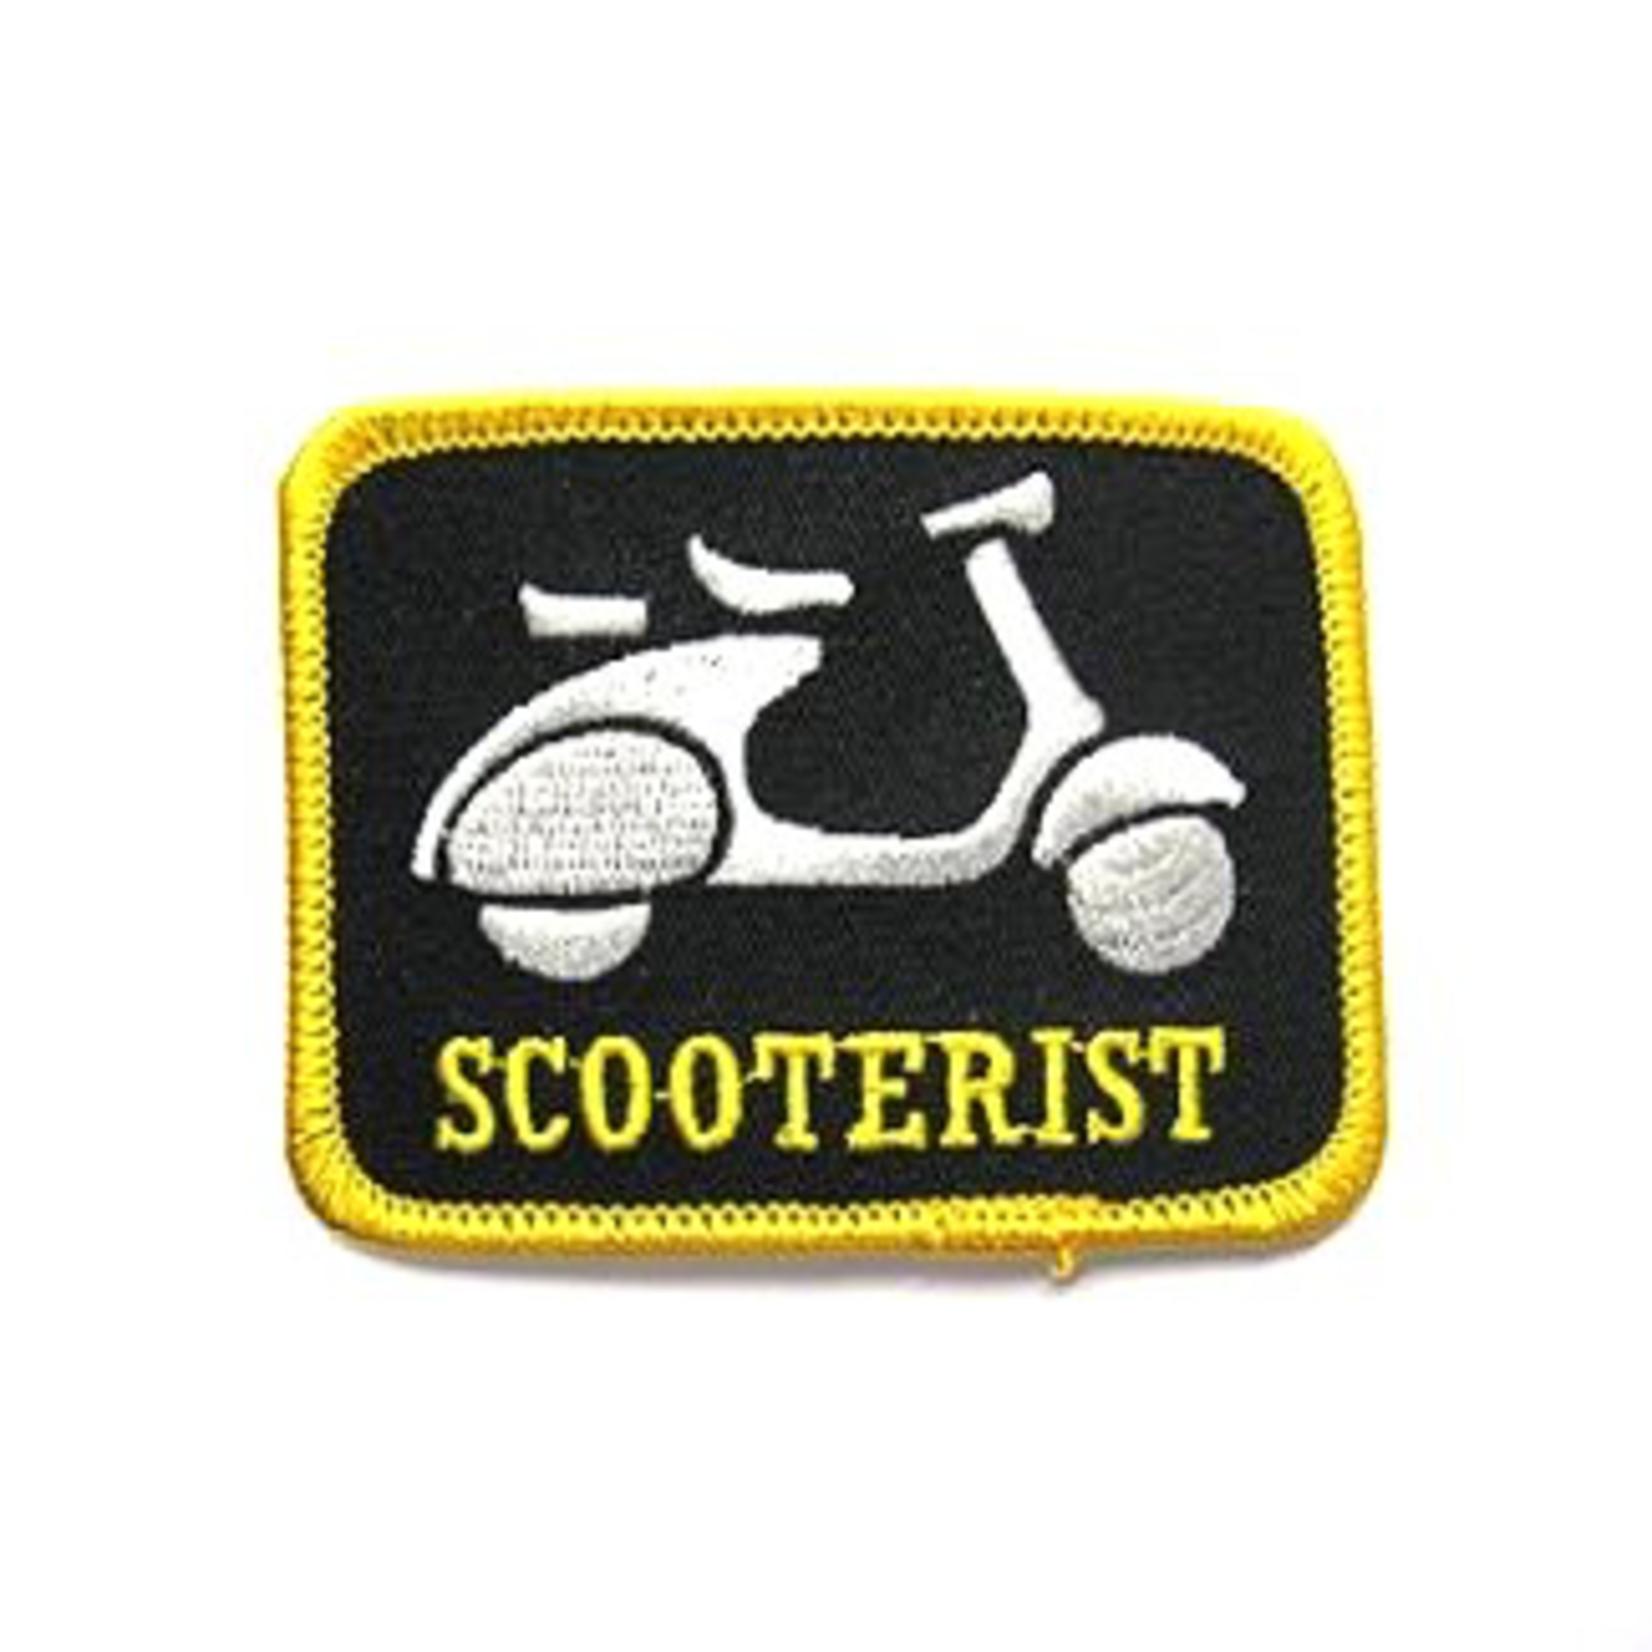 Lifestyle Patch, 'Scooterist'